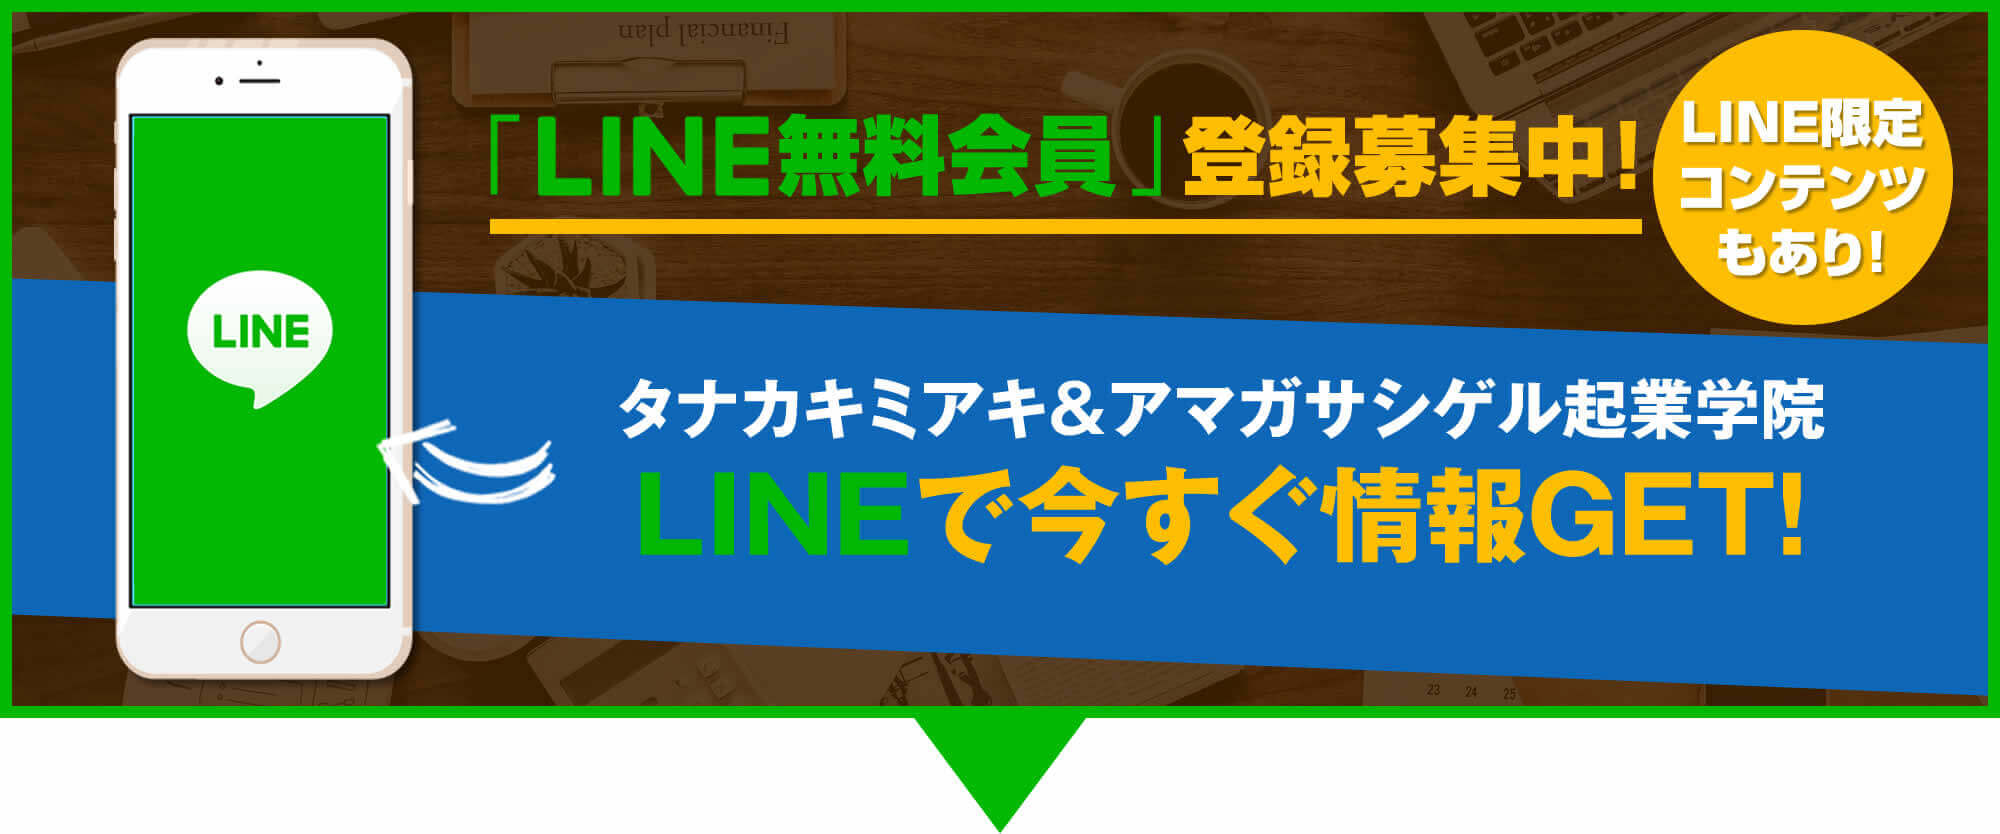 LINE登録者募集中